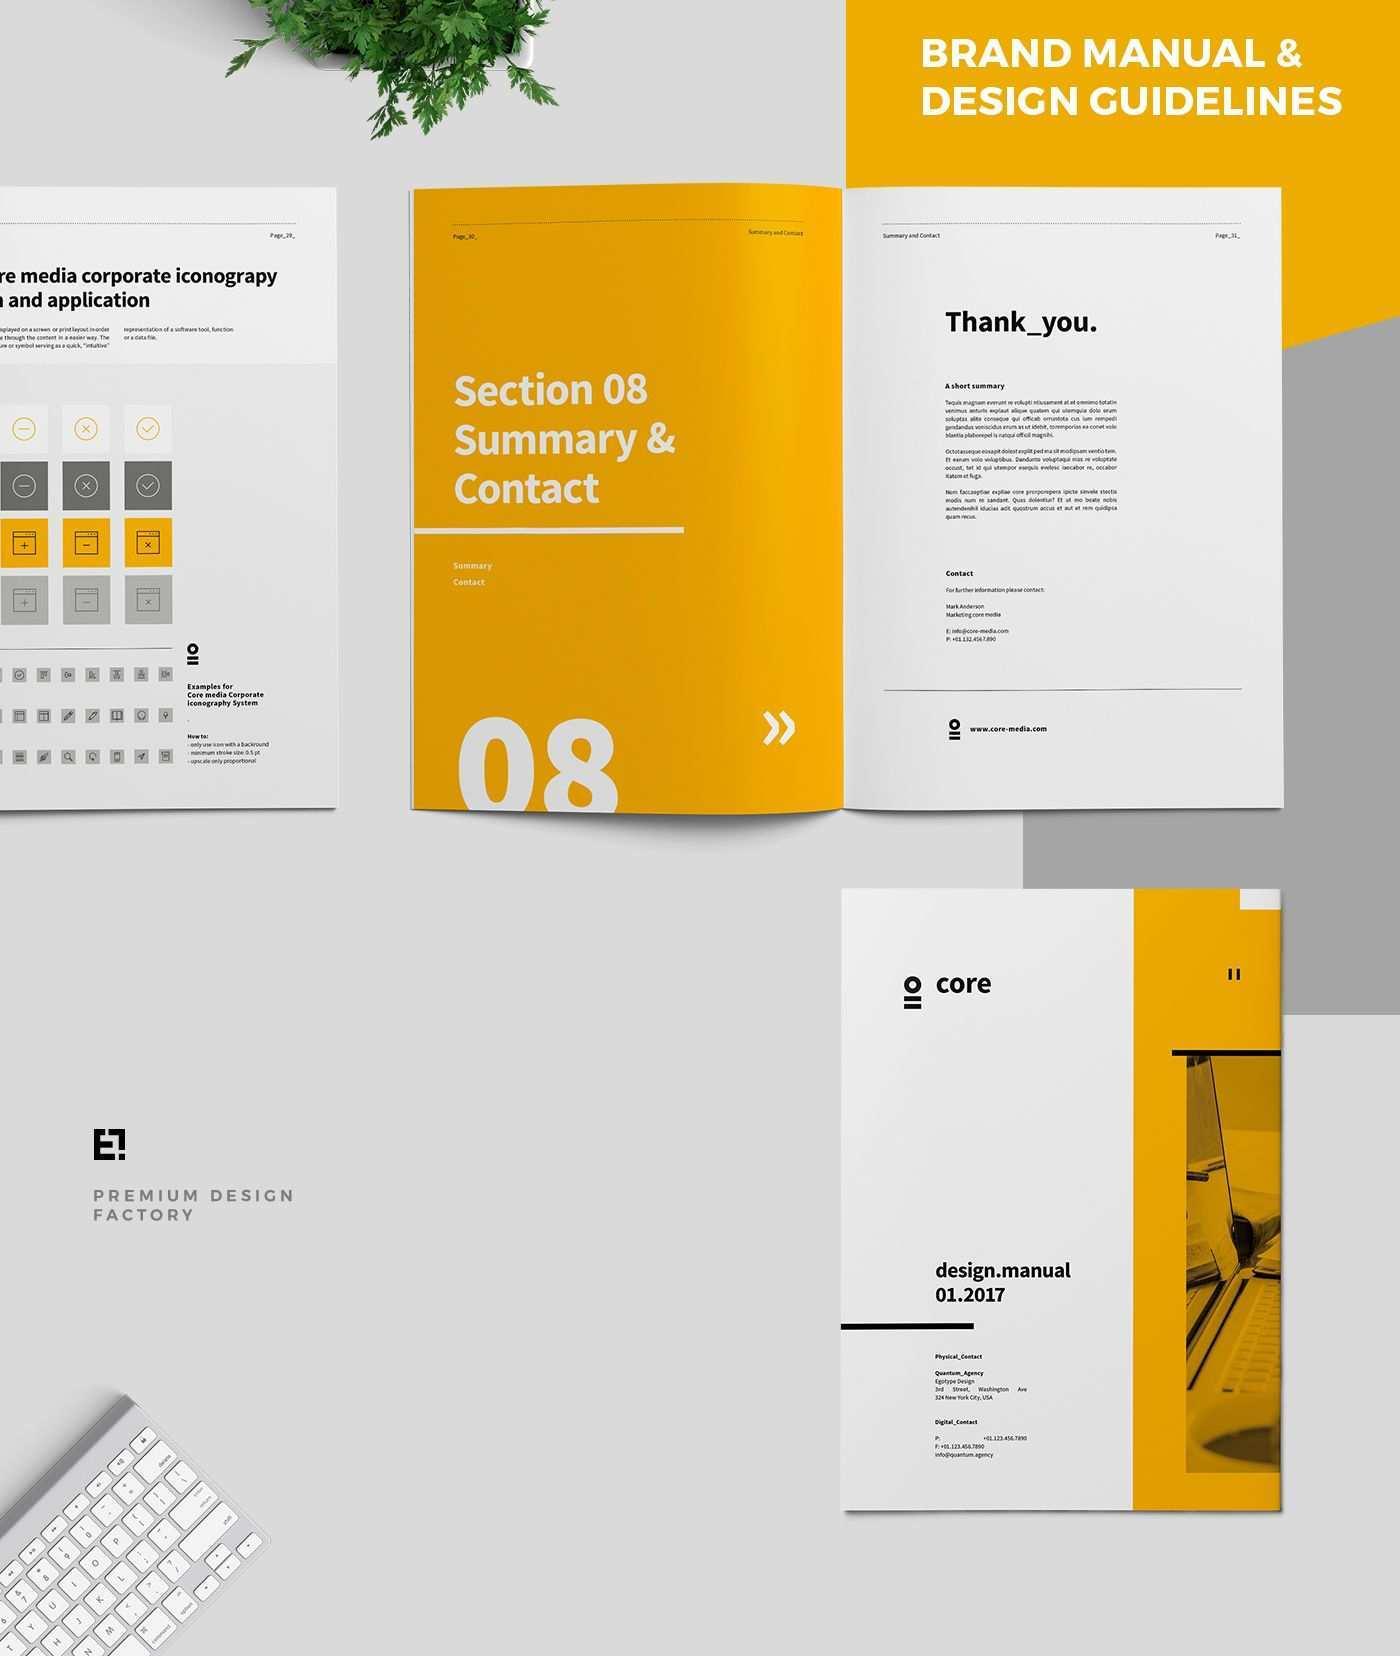 Core Brand Manual Guidelines On Behance Booklet Design Workbook Design Brand Manual